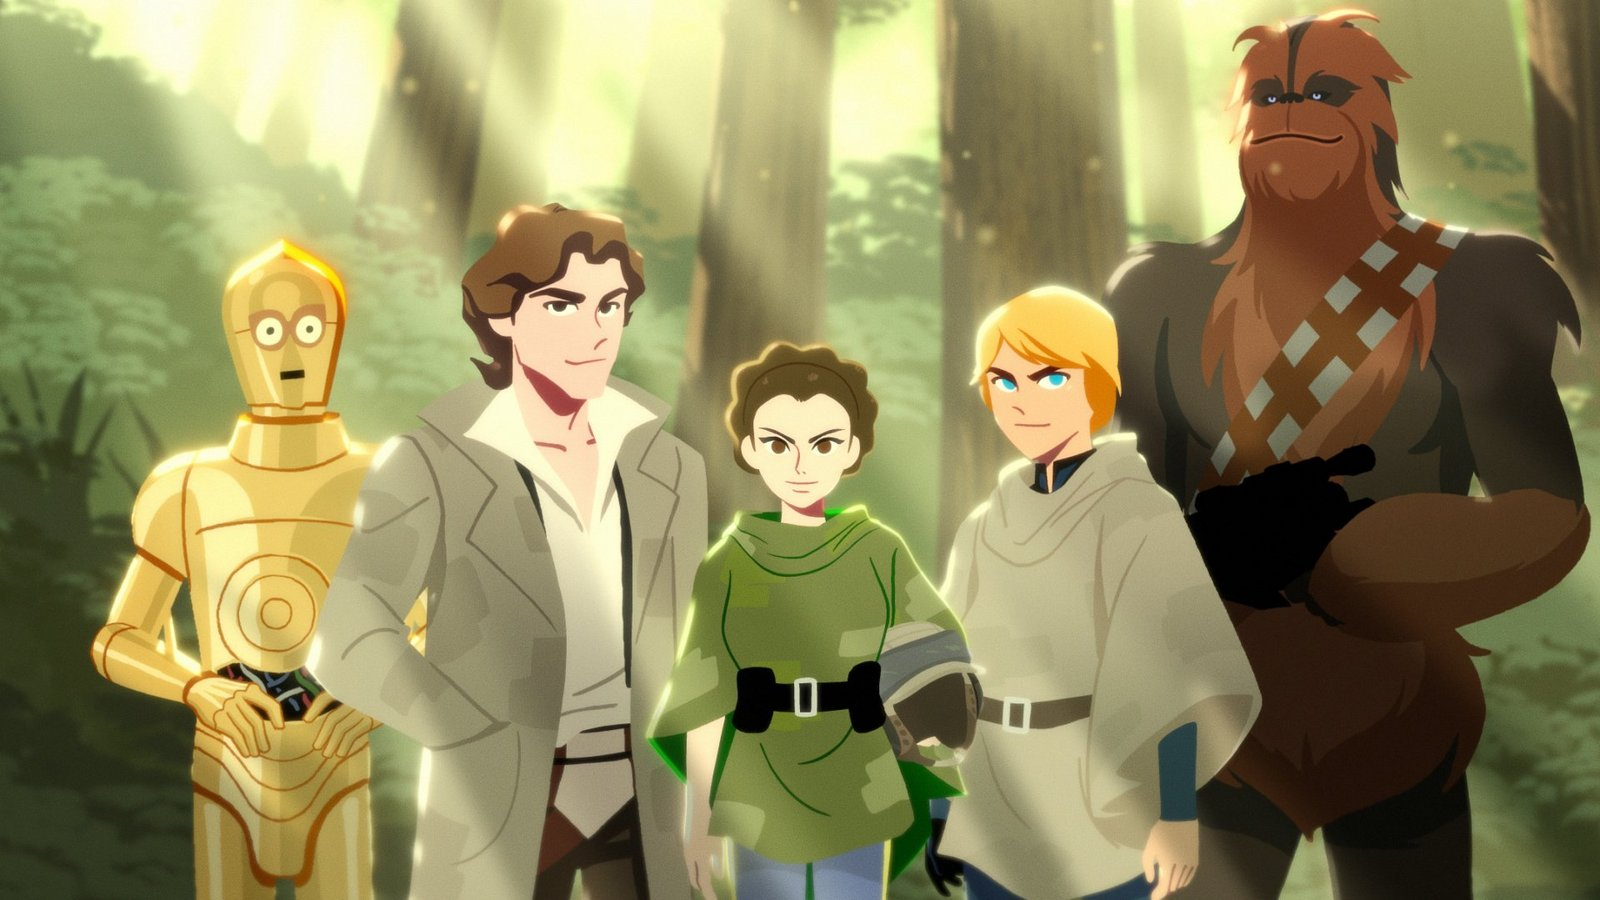 """Leia Organa - A Princess, A General, A Mentor"""